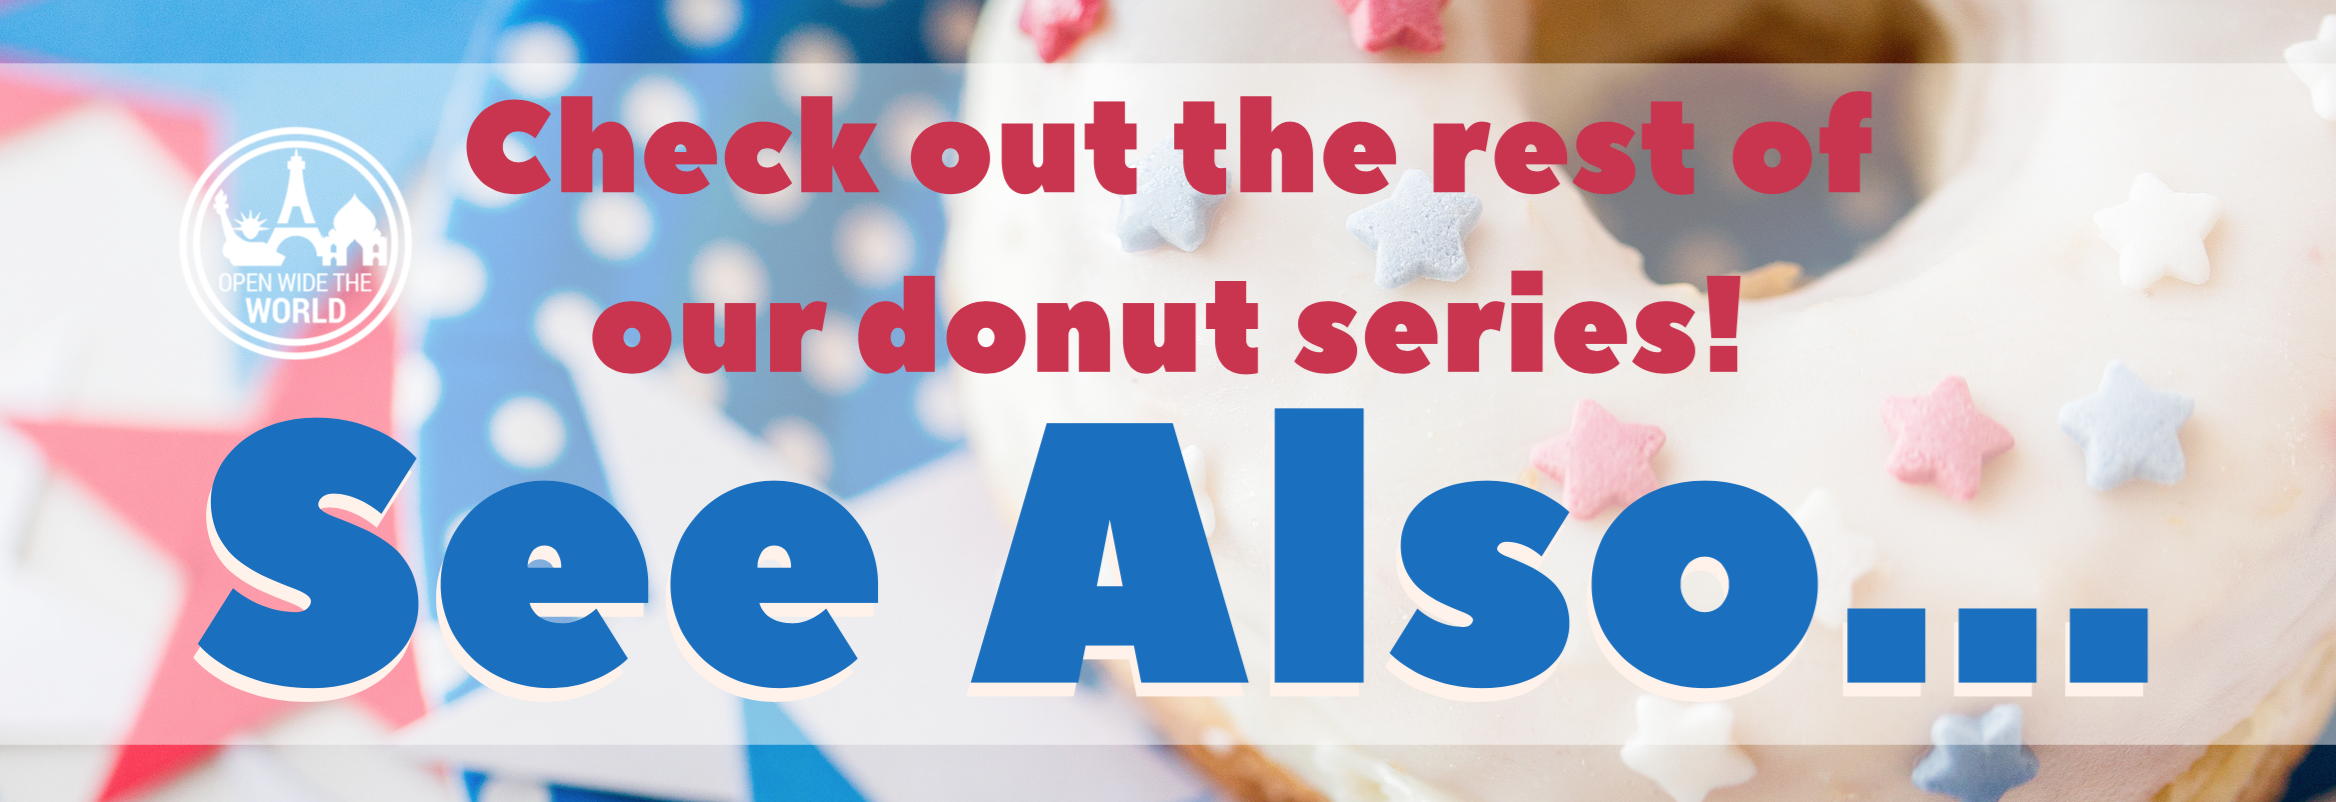 donuts in america OWtW